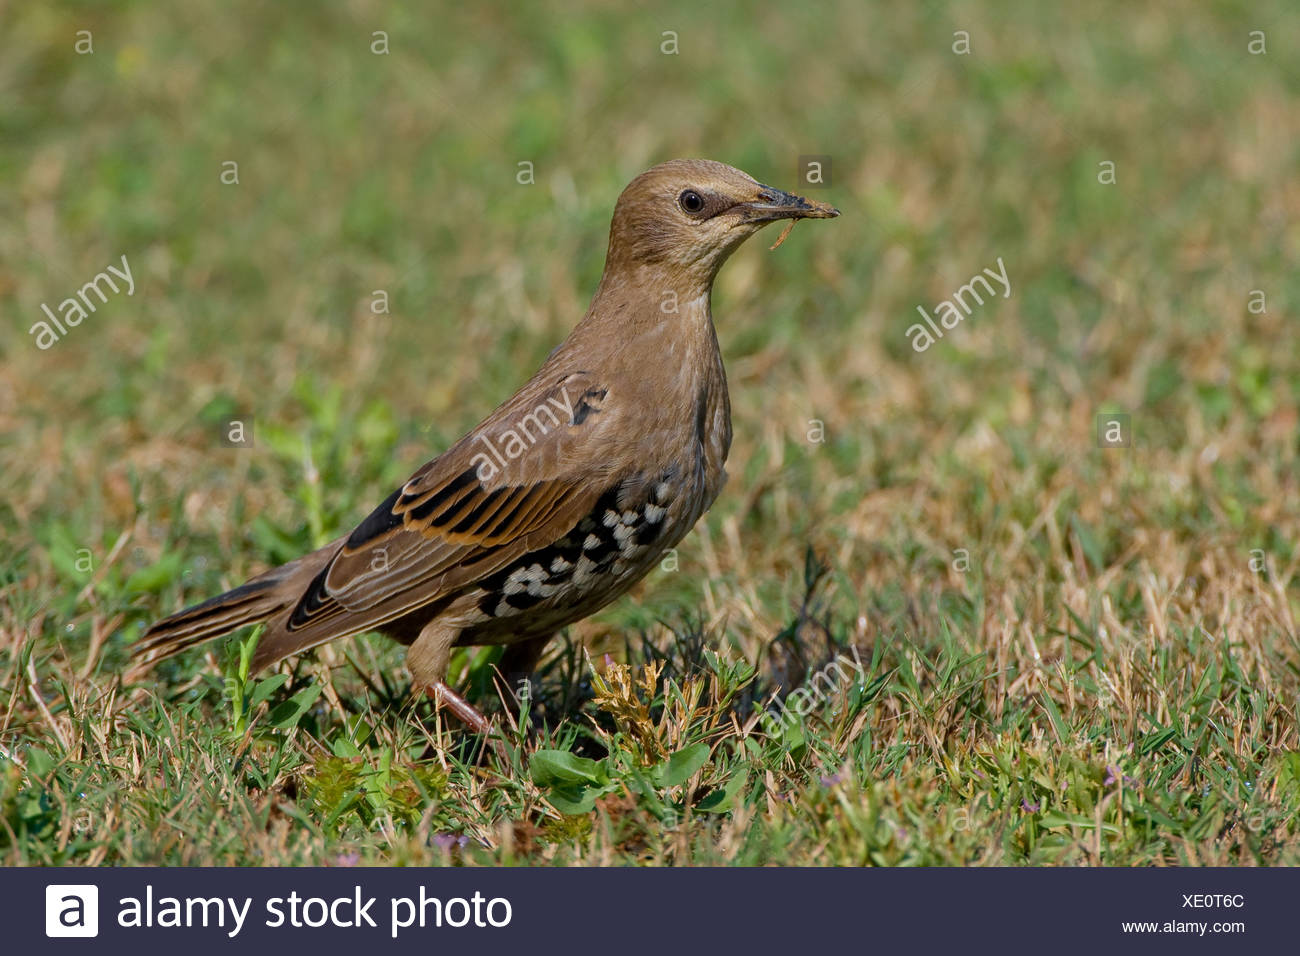 Een spreeuw in een grasveldje. A Common Starling in a patch of grass. - Stock Image